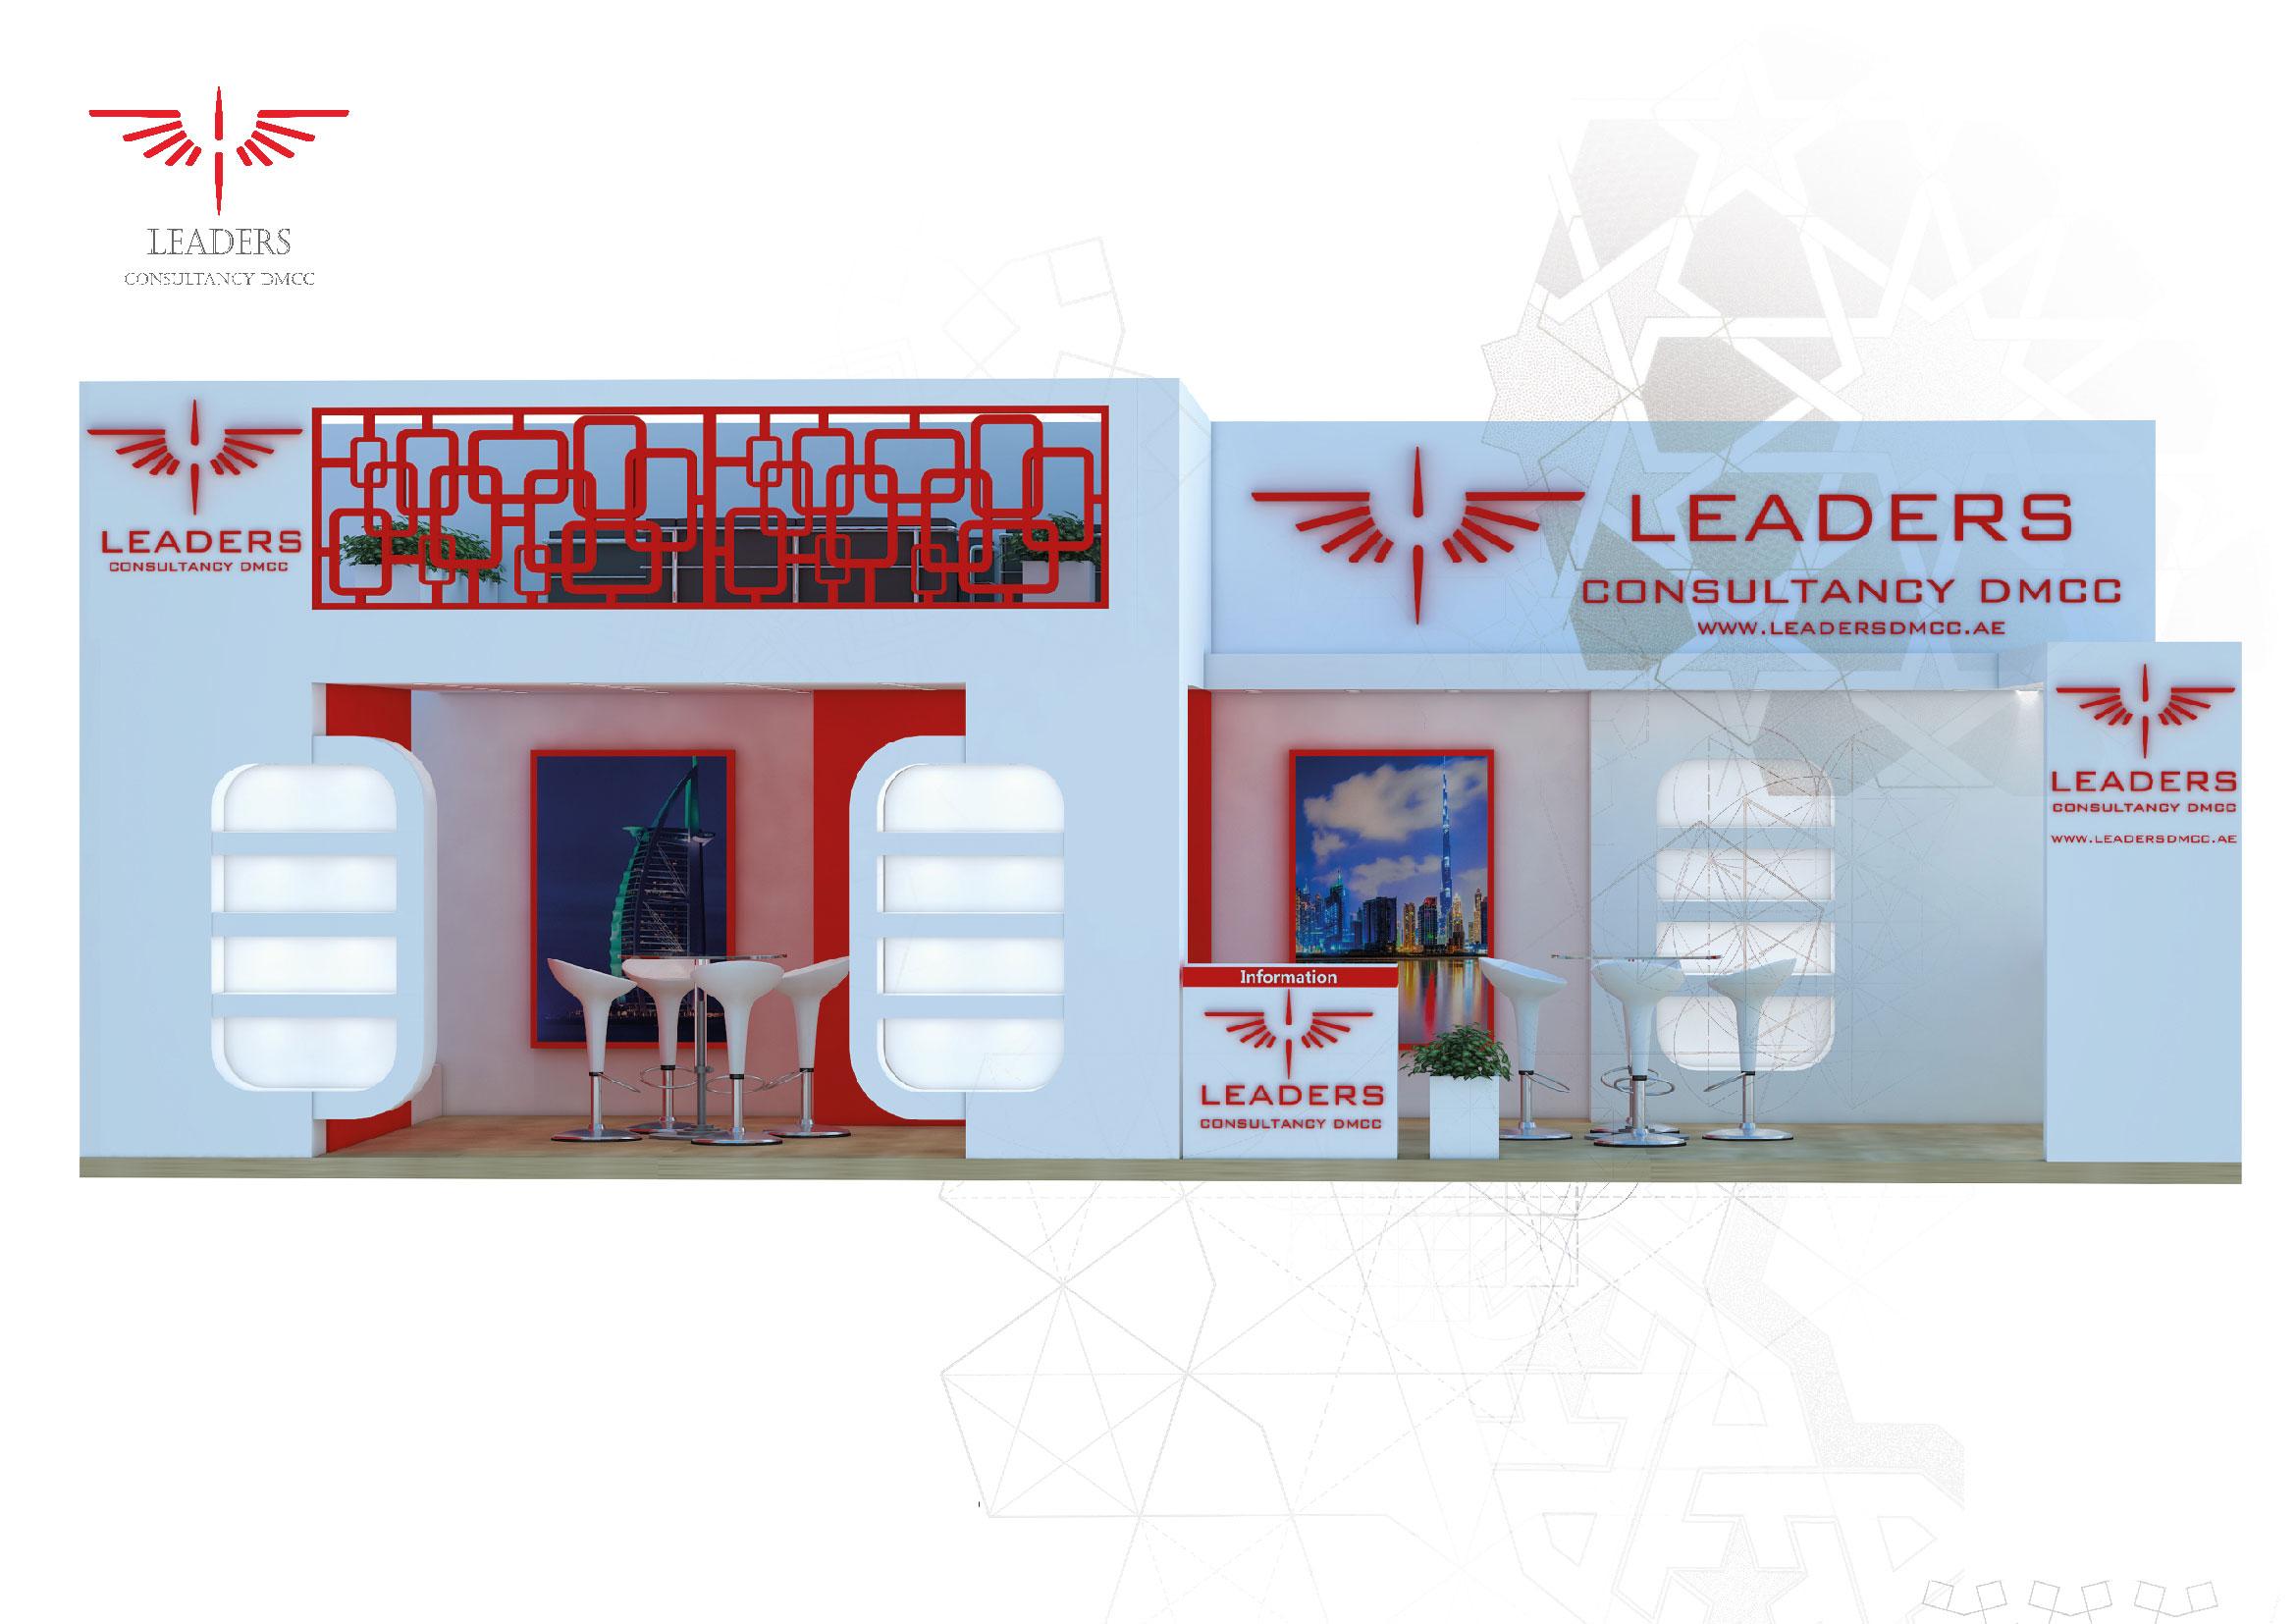 Exhibition Stand Design Kenya : Majaz arts exhibitions & booth design